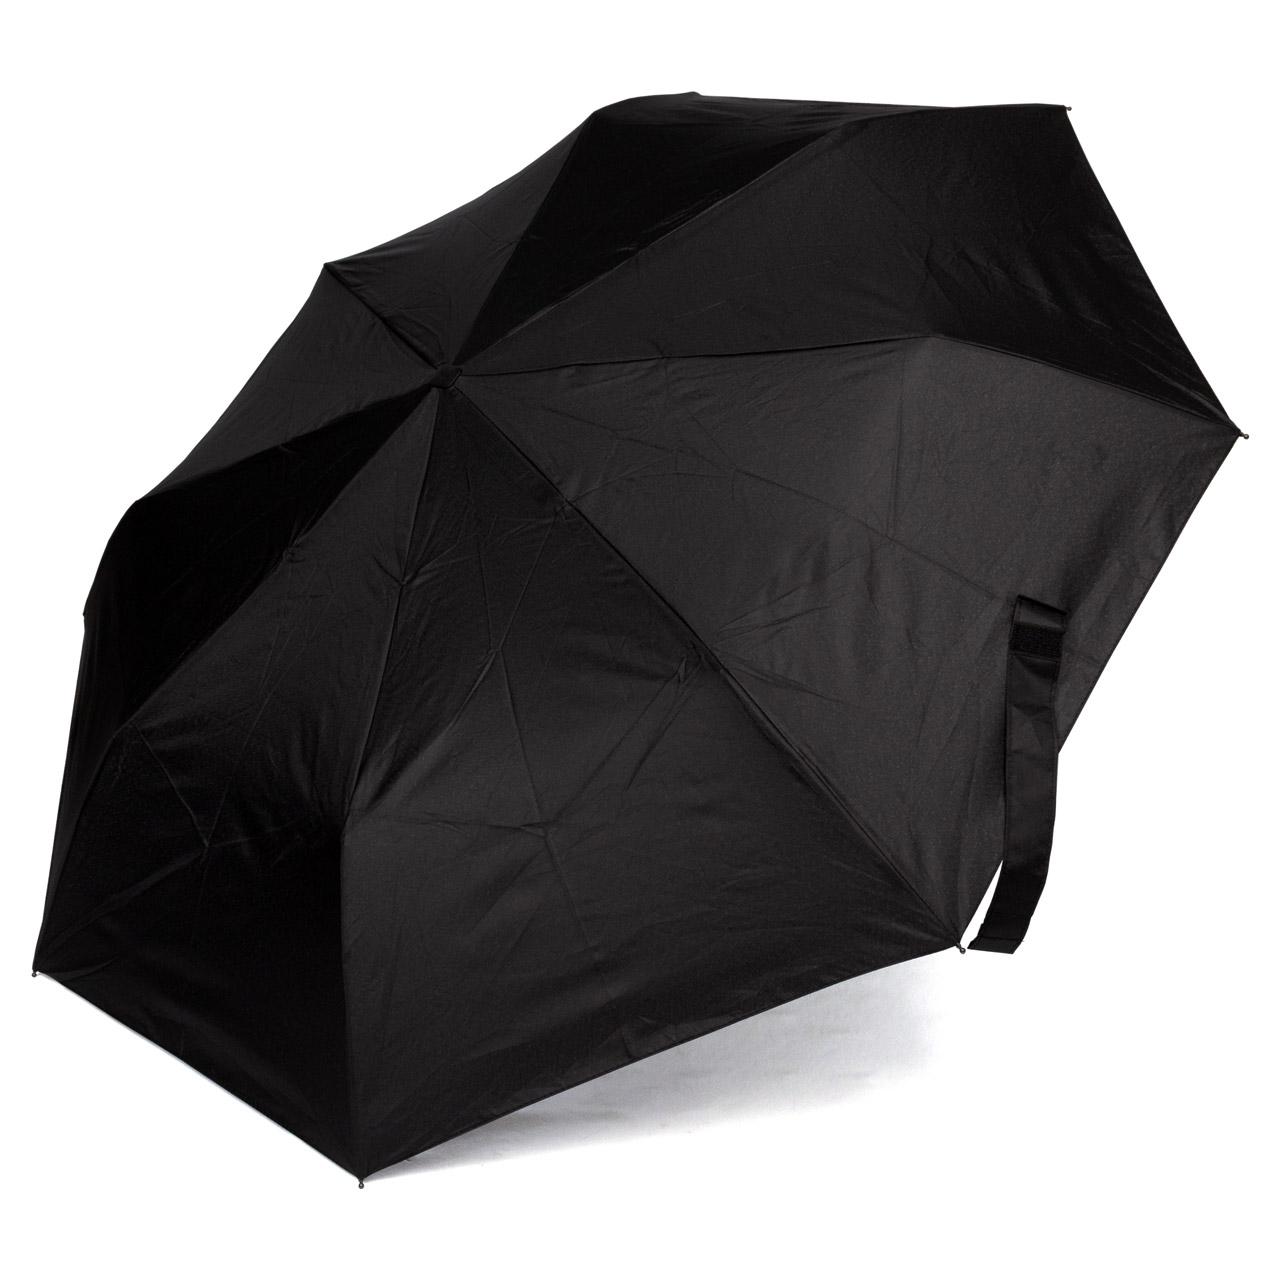 ORIGINAL Skoda Regenschirm Schirm Kodiaq Octavia 4 Superb 3 000087600G 9B9